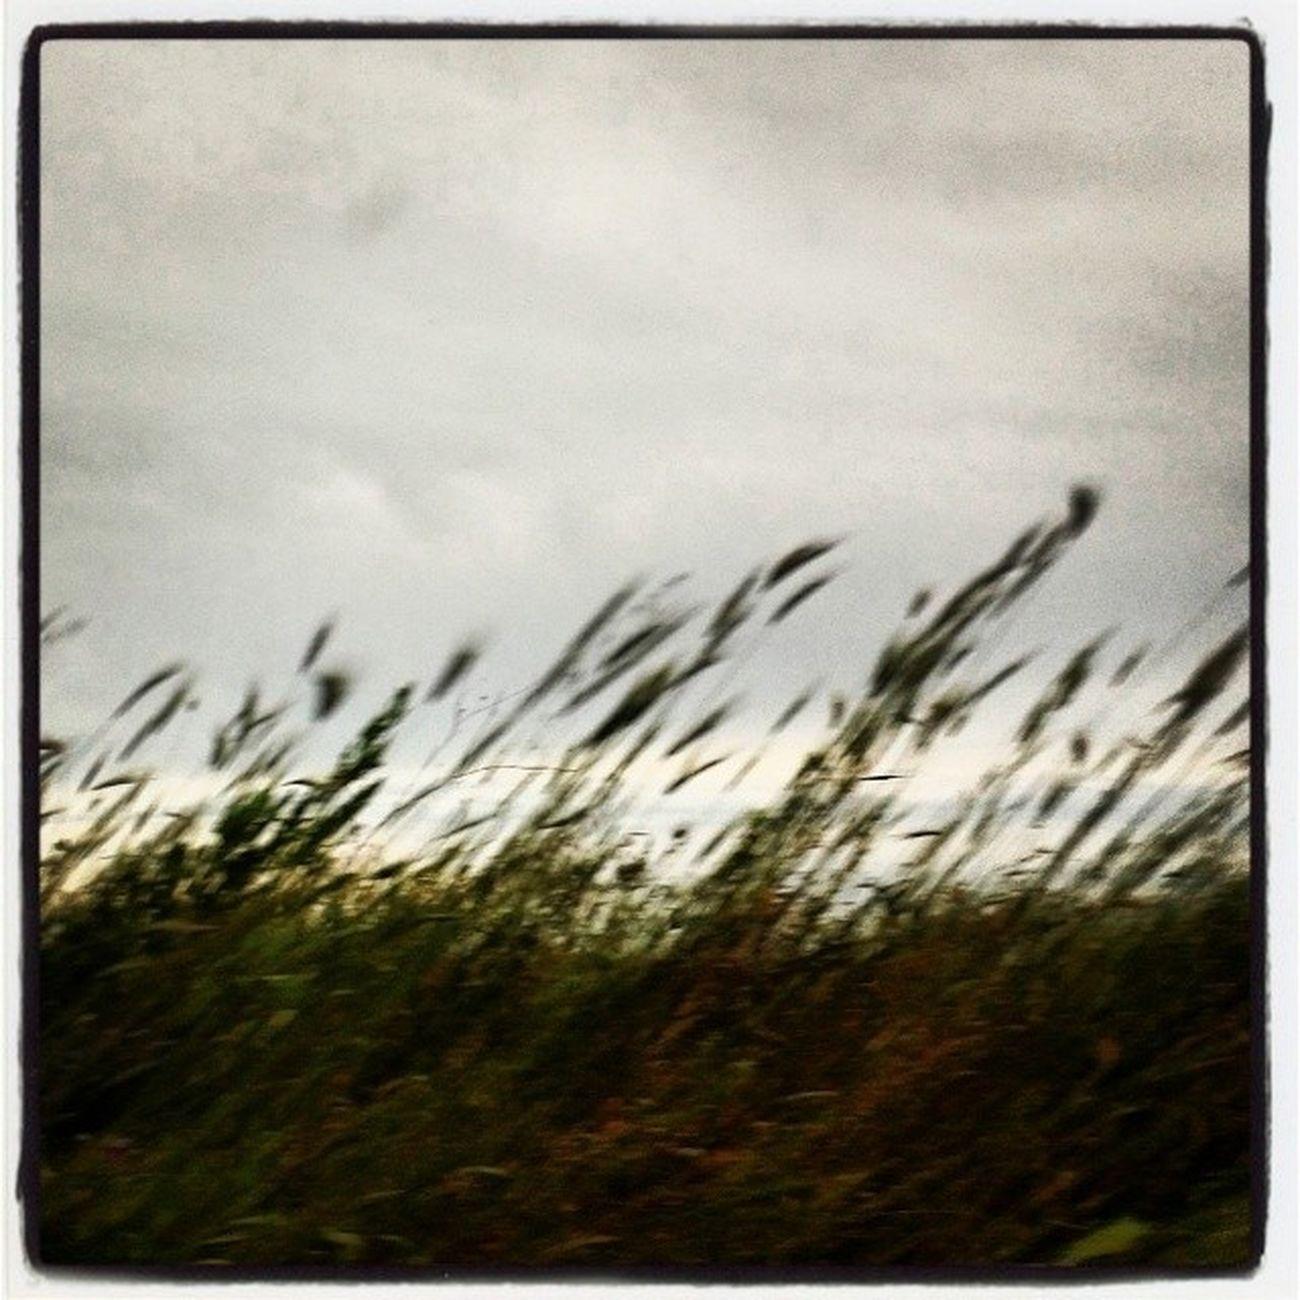 ... Maestrale Sardegna Wind Terra Sarda  Remember